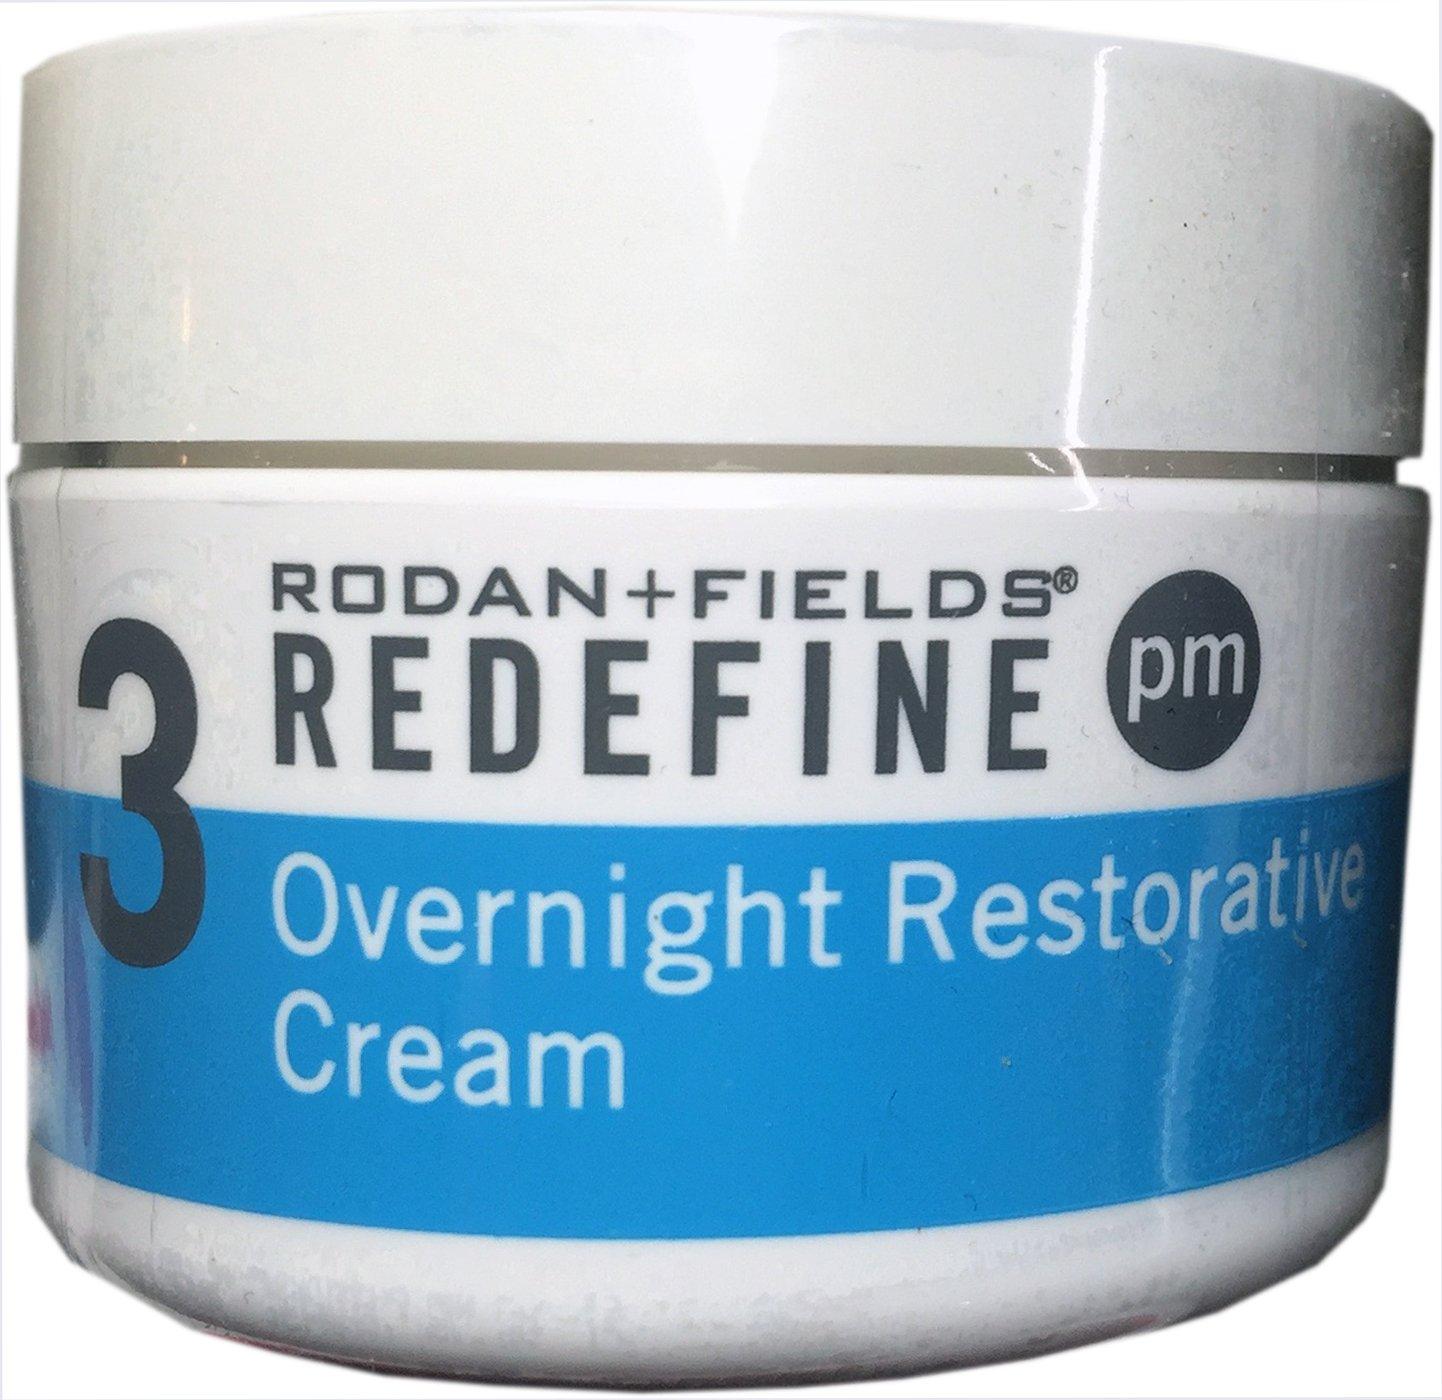 Rodan + Fields REDEFINE Overnight Restorative Cream (Creme), 30 mL/1.0 Fl. Oz.